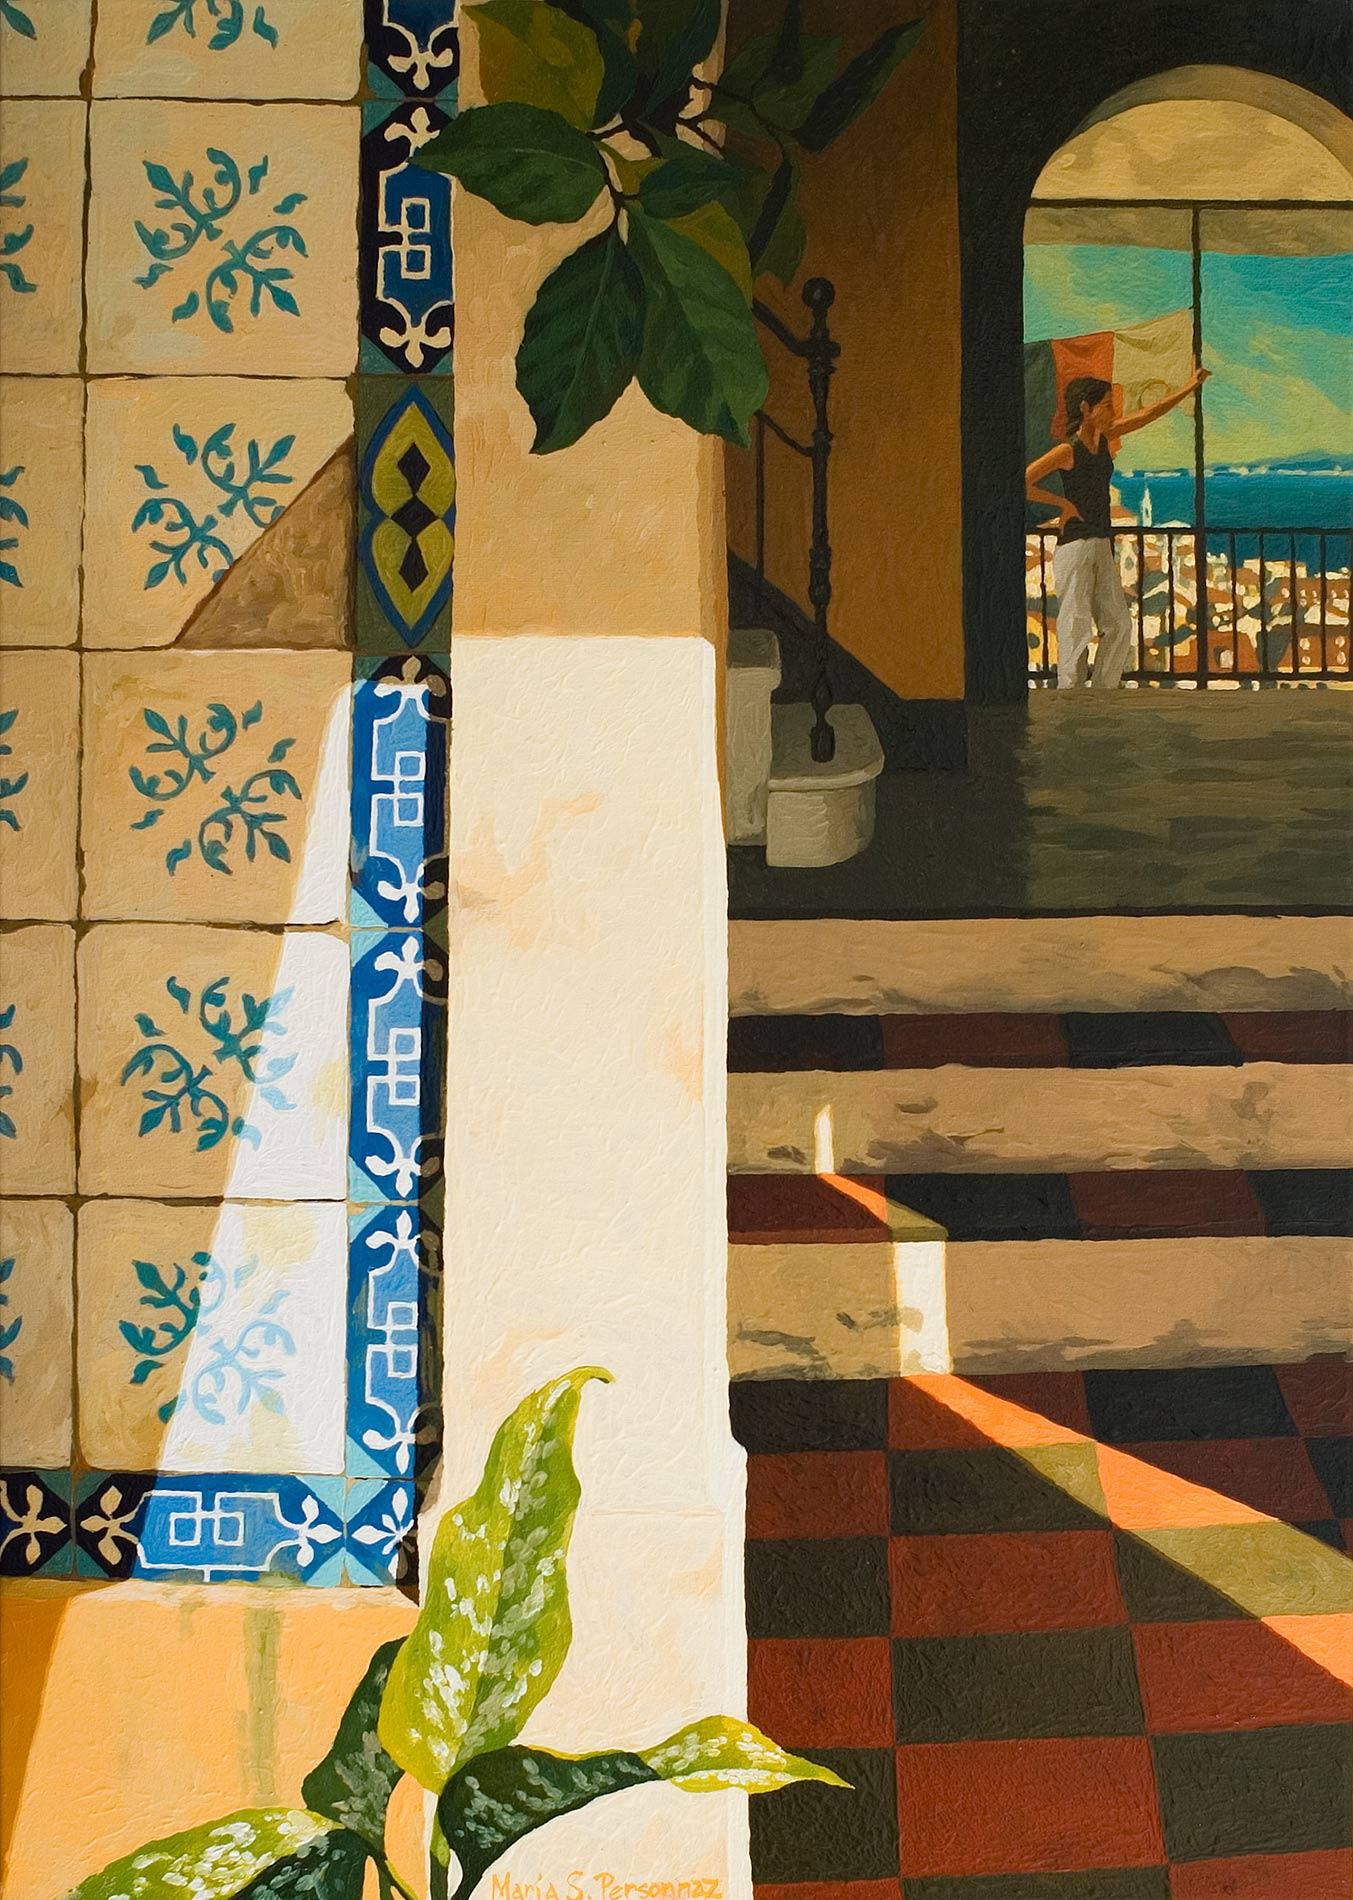 Azuleijos et Lisbonne